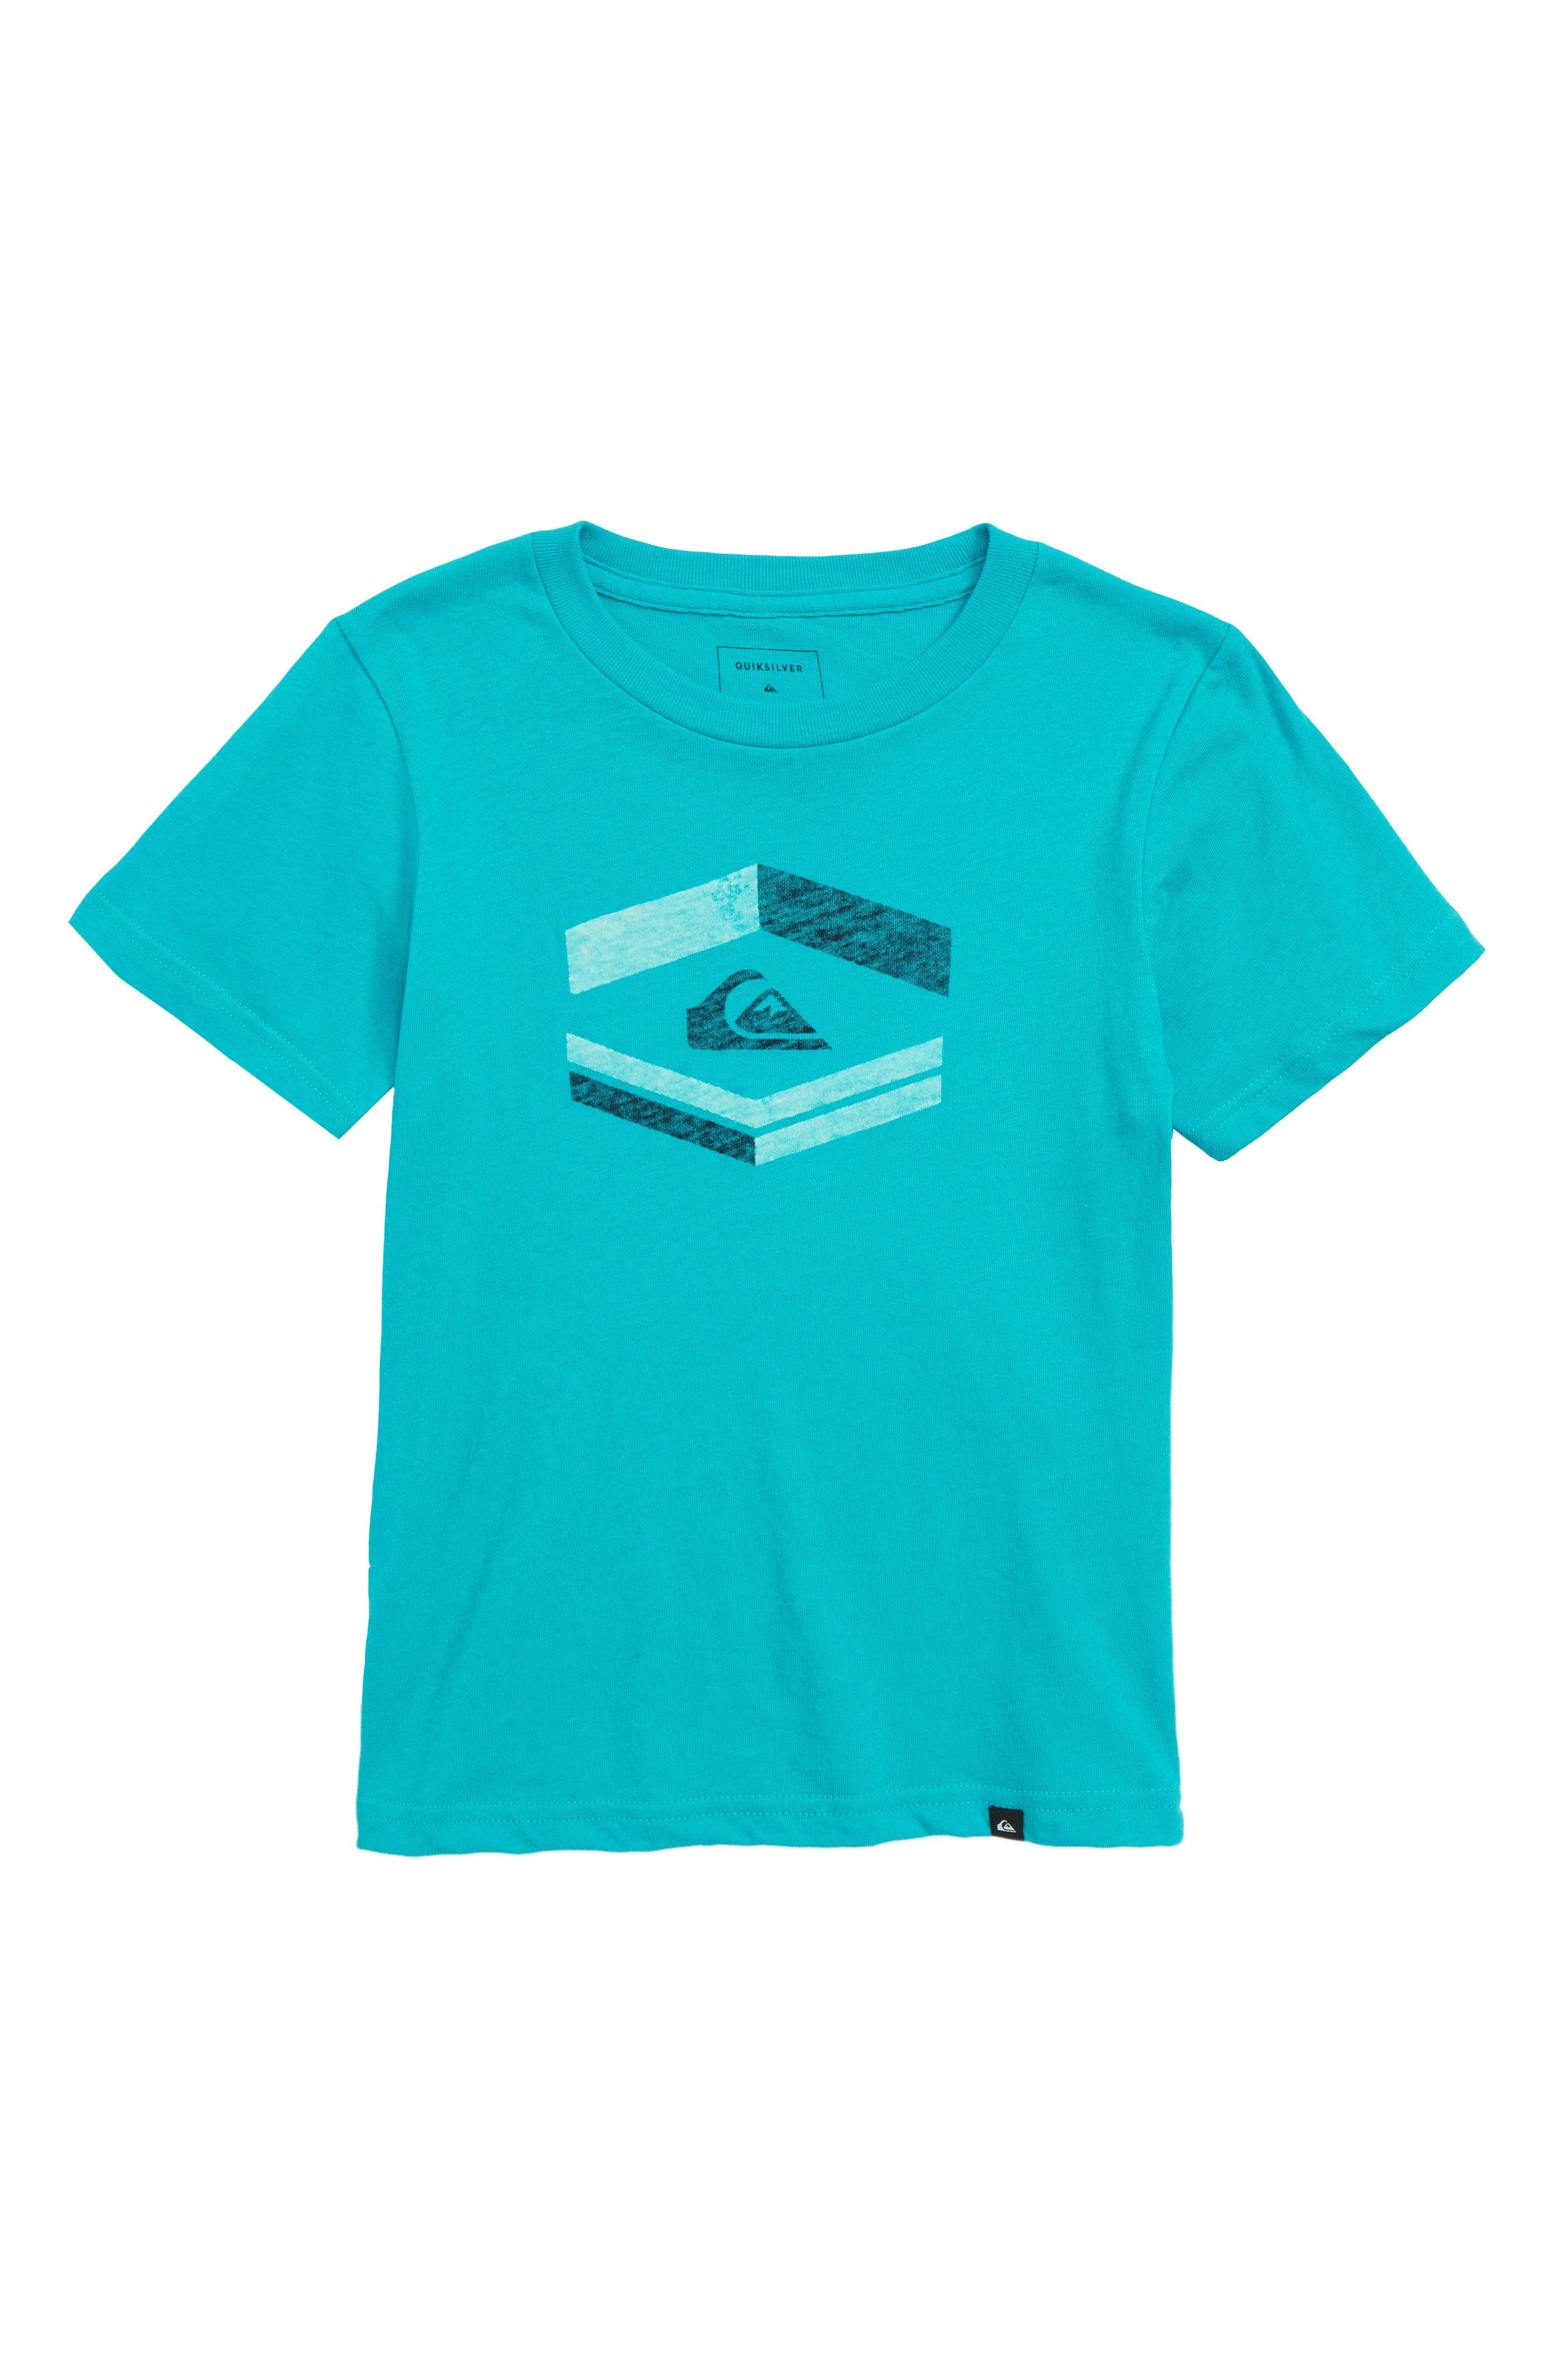 Major Tone Graphic T-Shirt,                             Main thumbnail 1, color,                             300